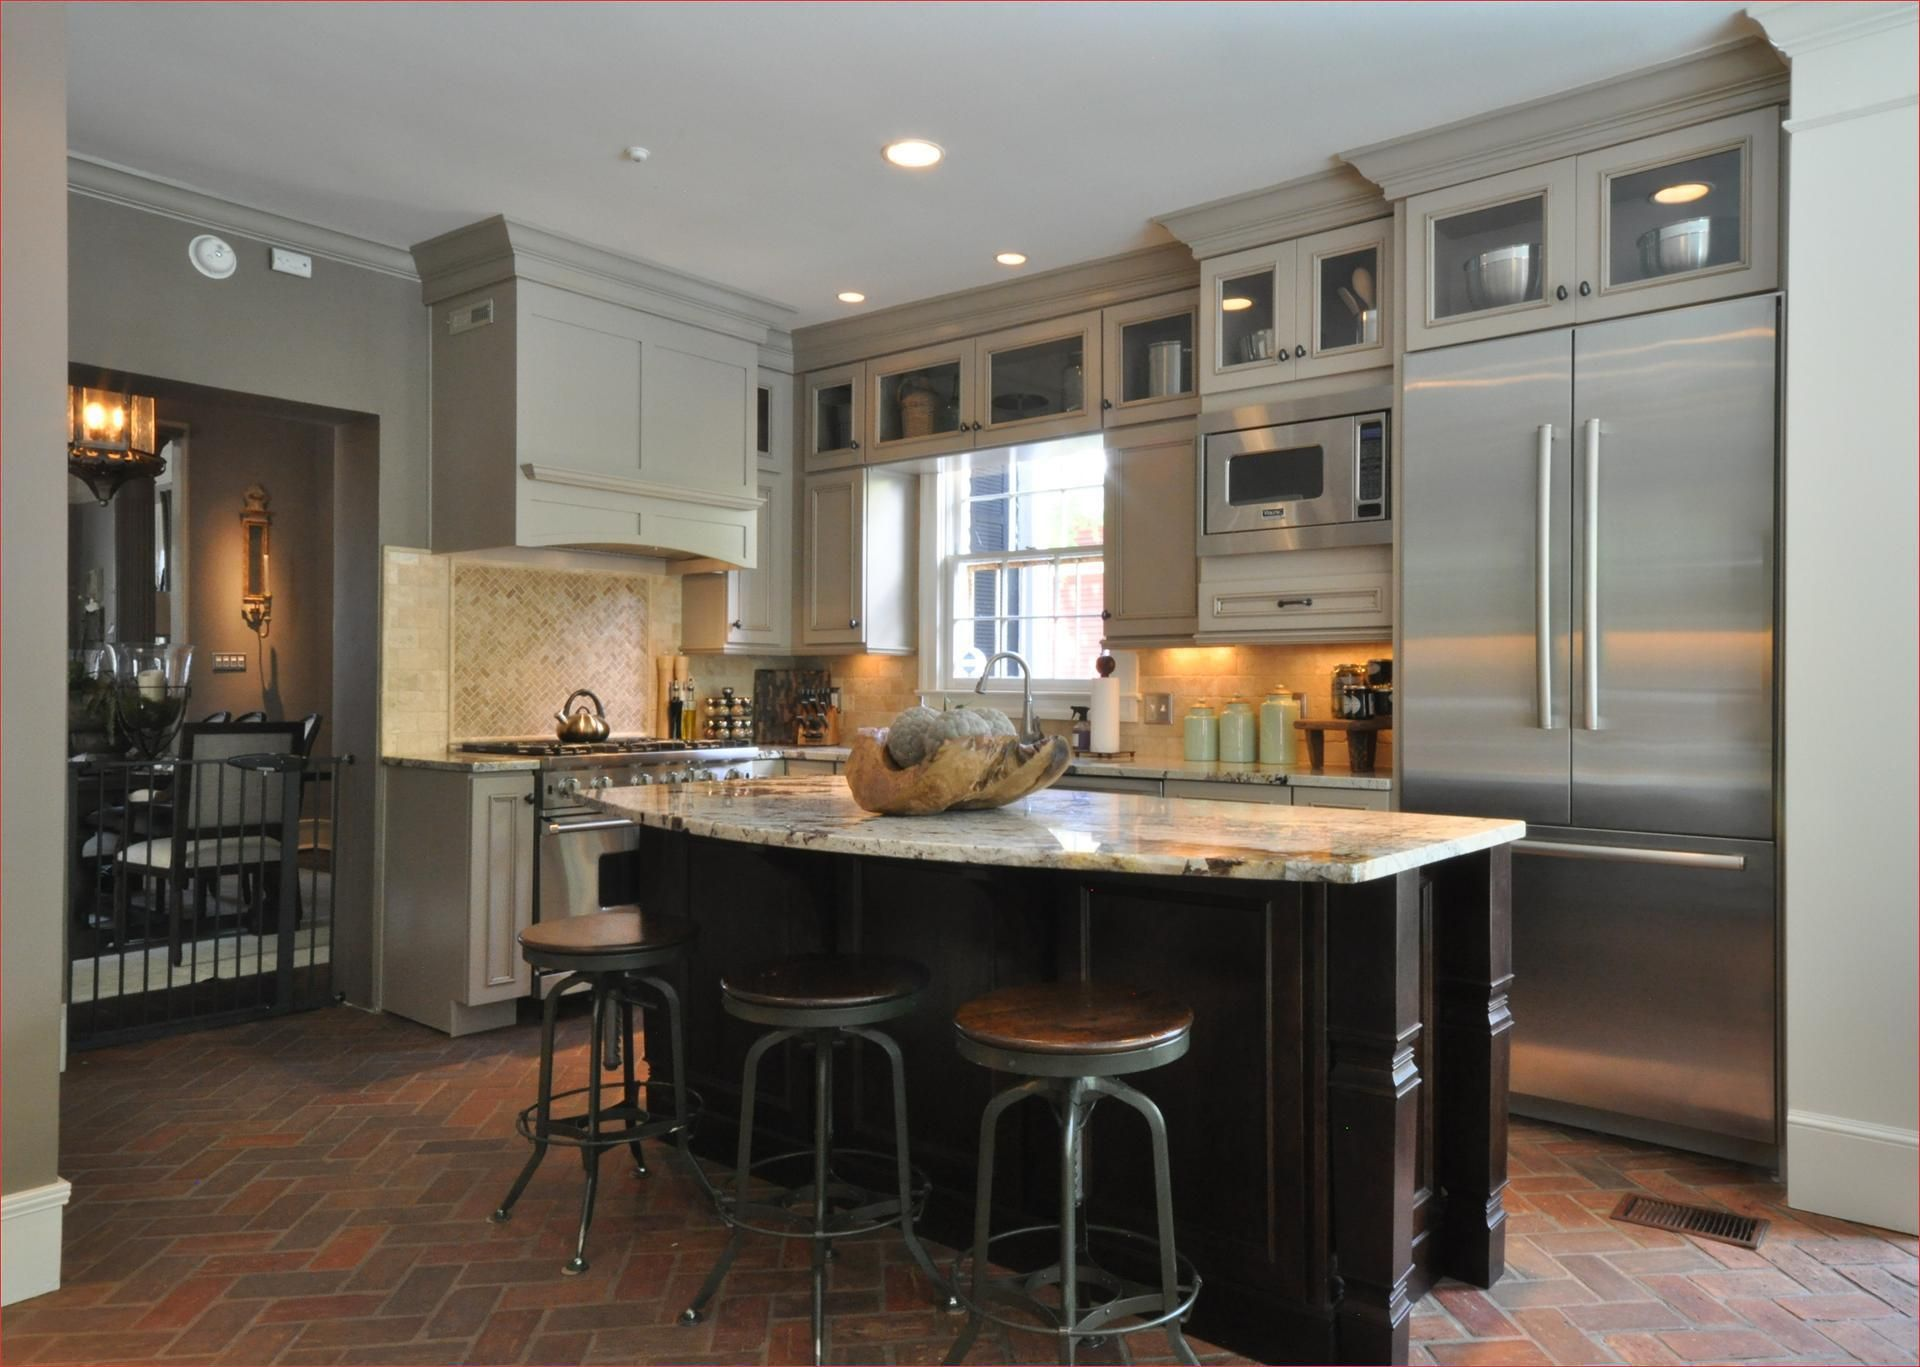 Historic Homes Kitchen Luxury Our Work